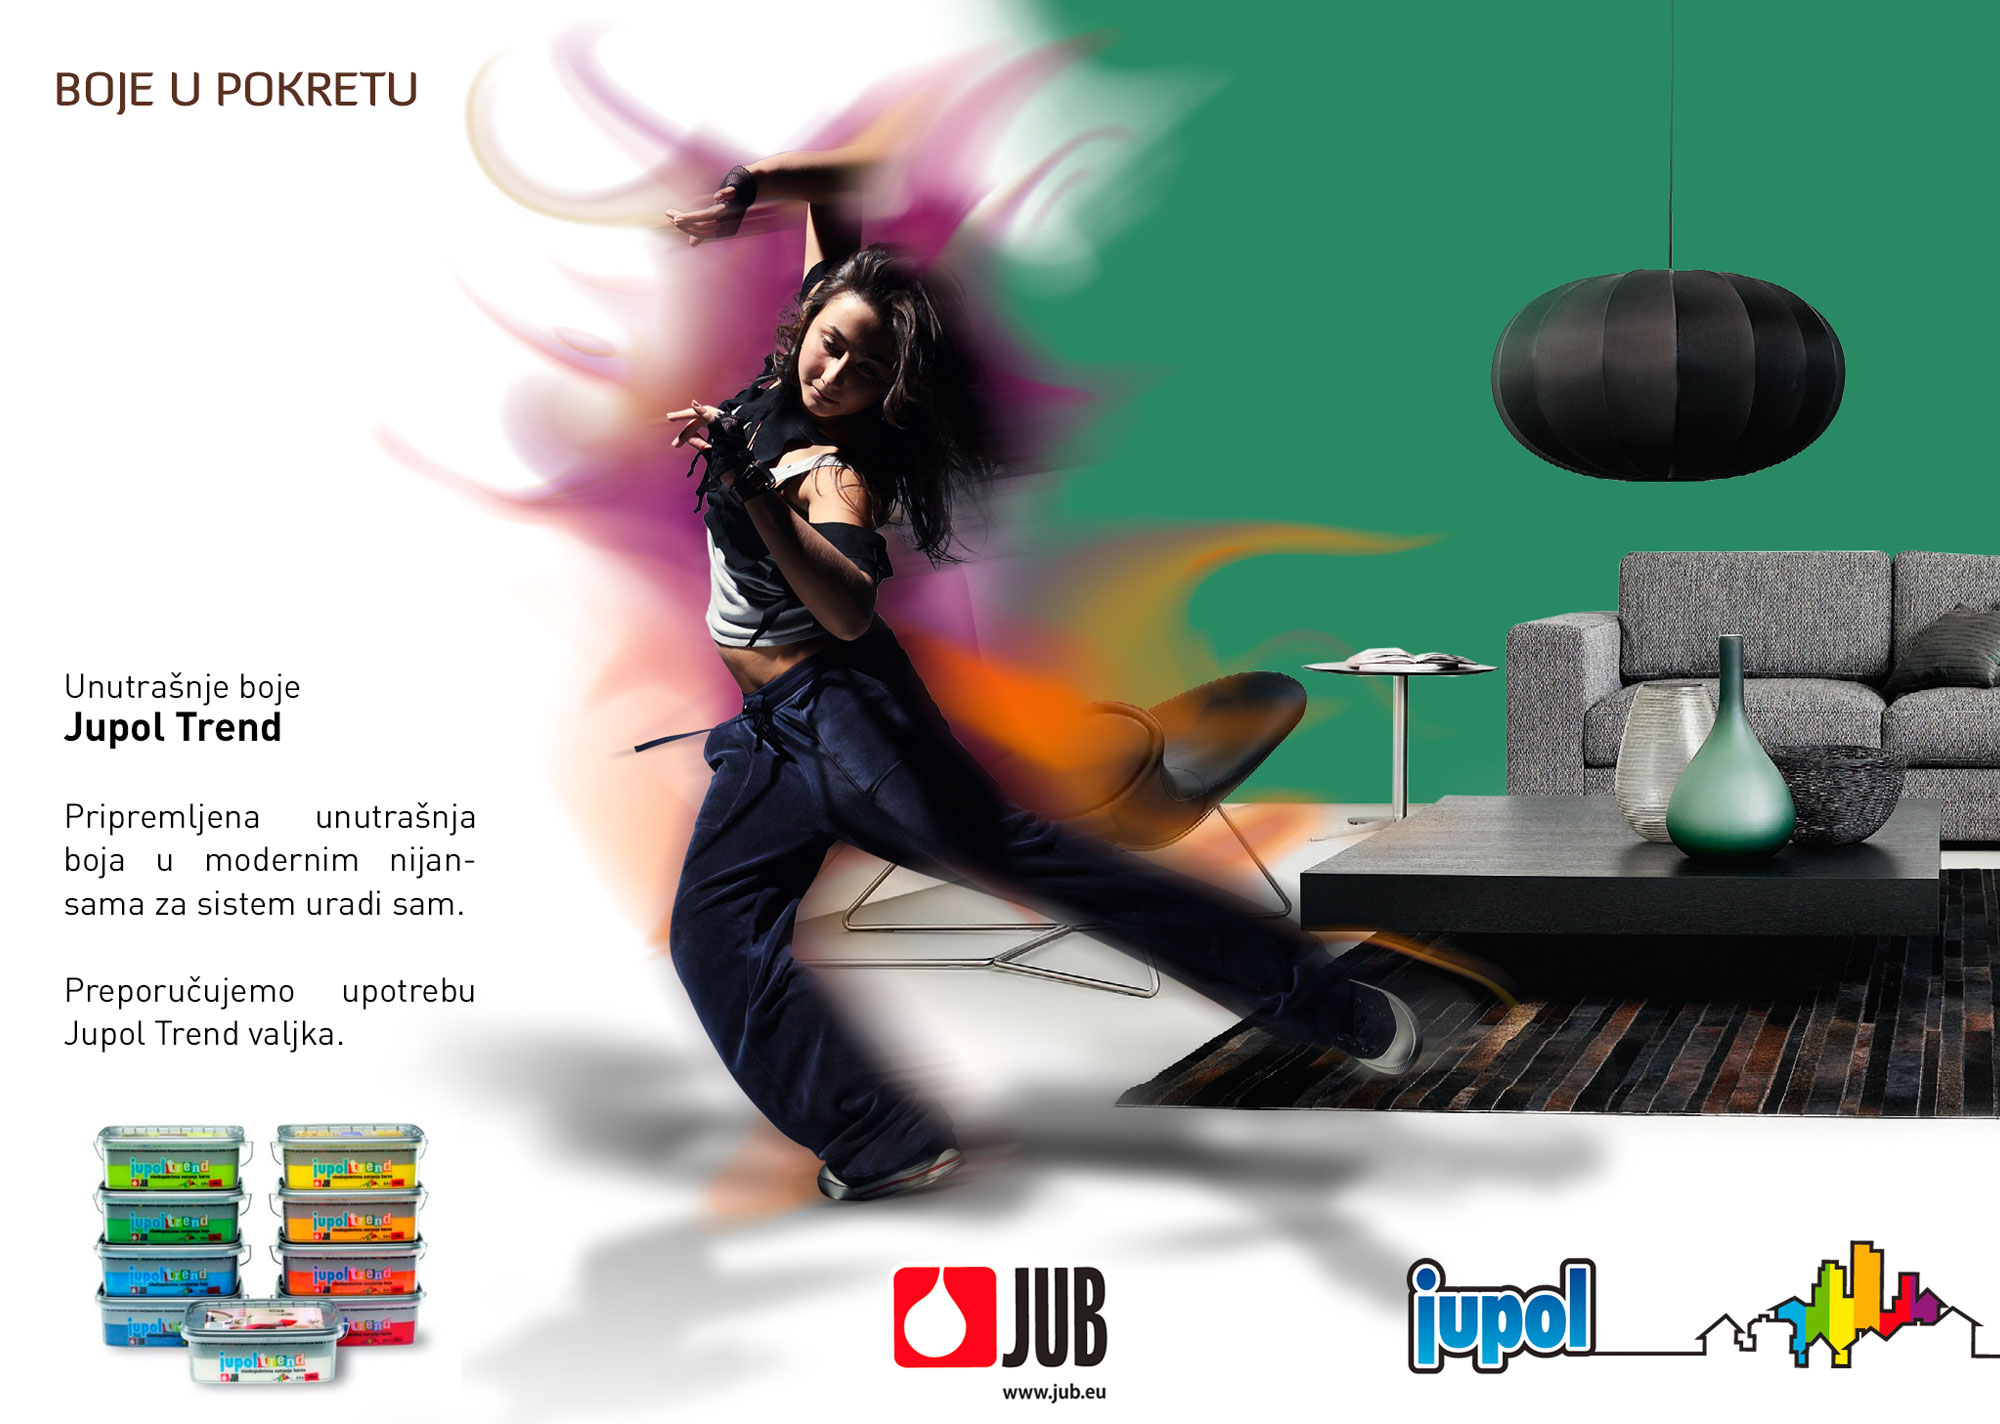 jub poster 3